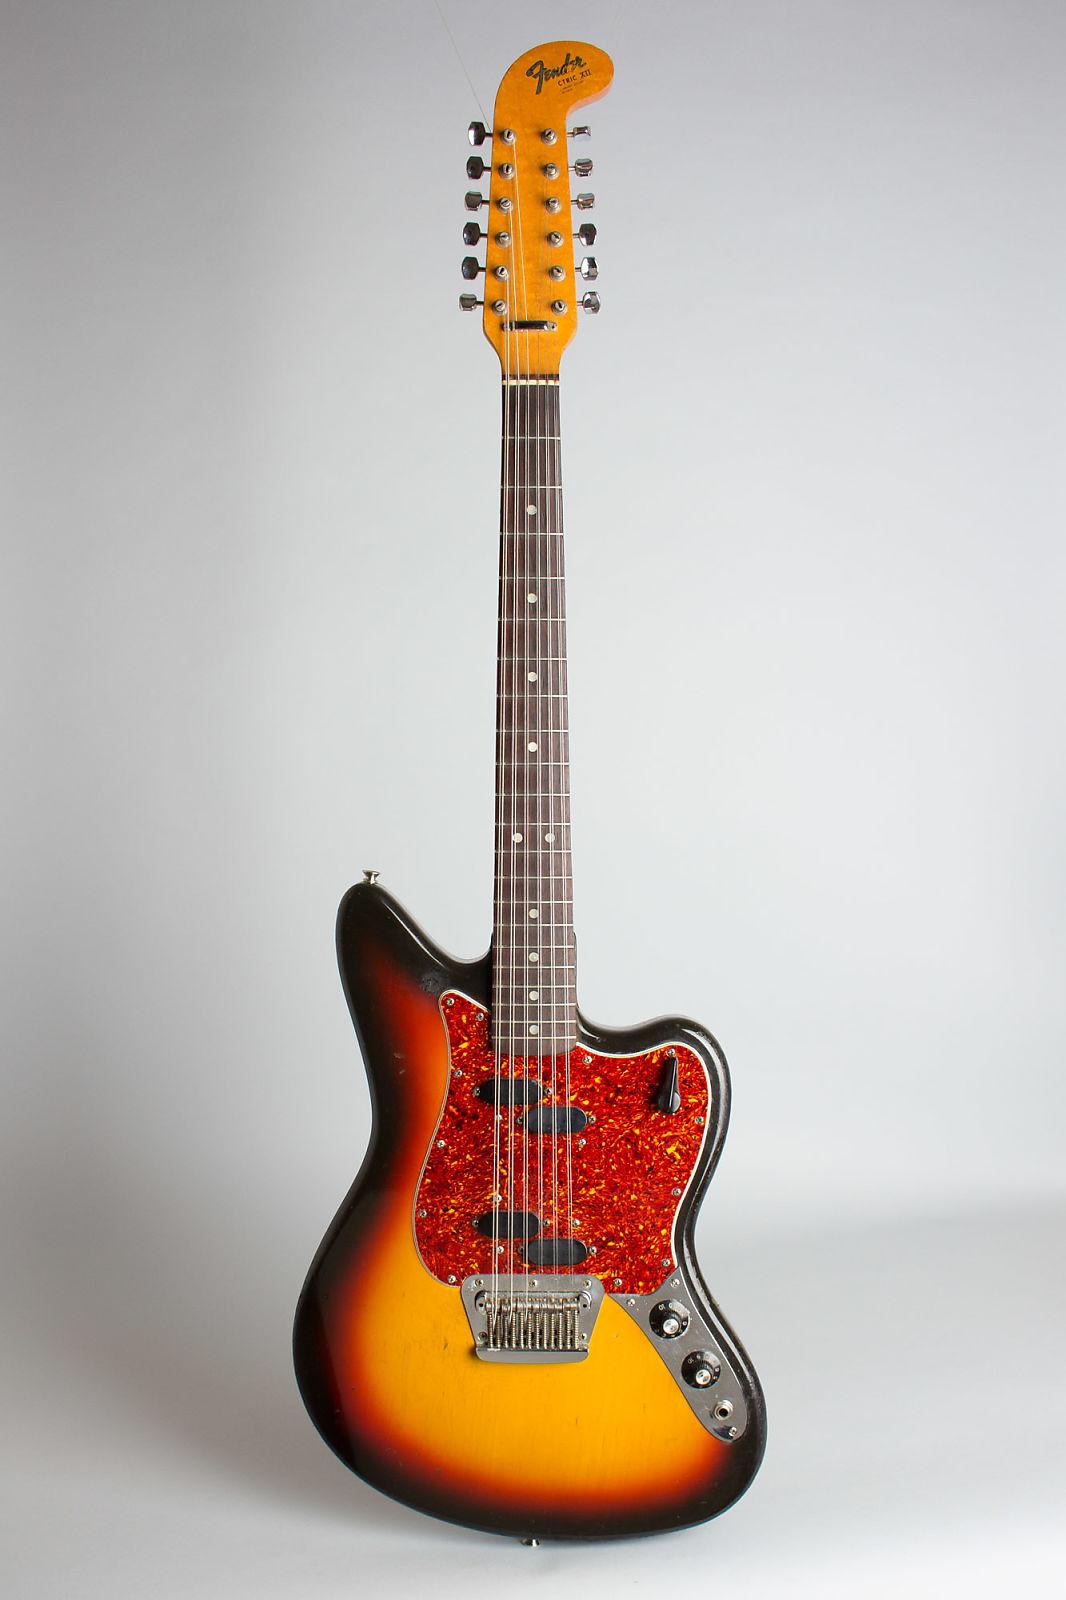 fender electric xii 12 string solid body electric guitar 1966 ser 129528 hard shell case. Black Bedroom Furniture Sets. Home Design Ideas